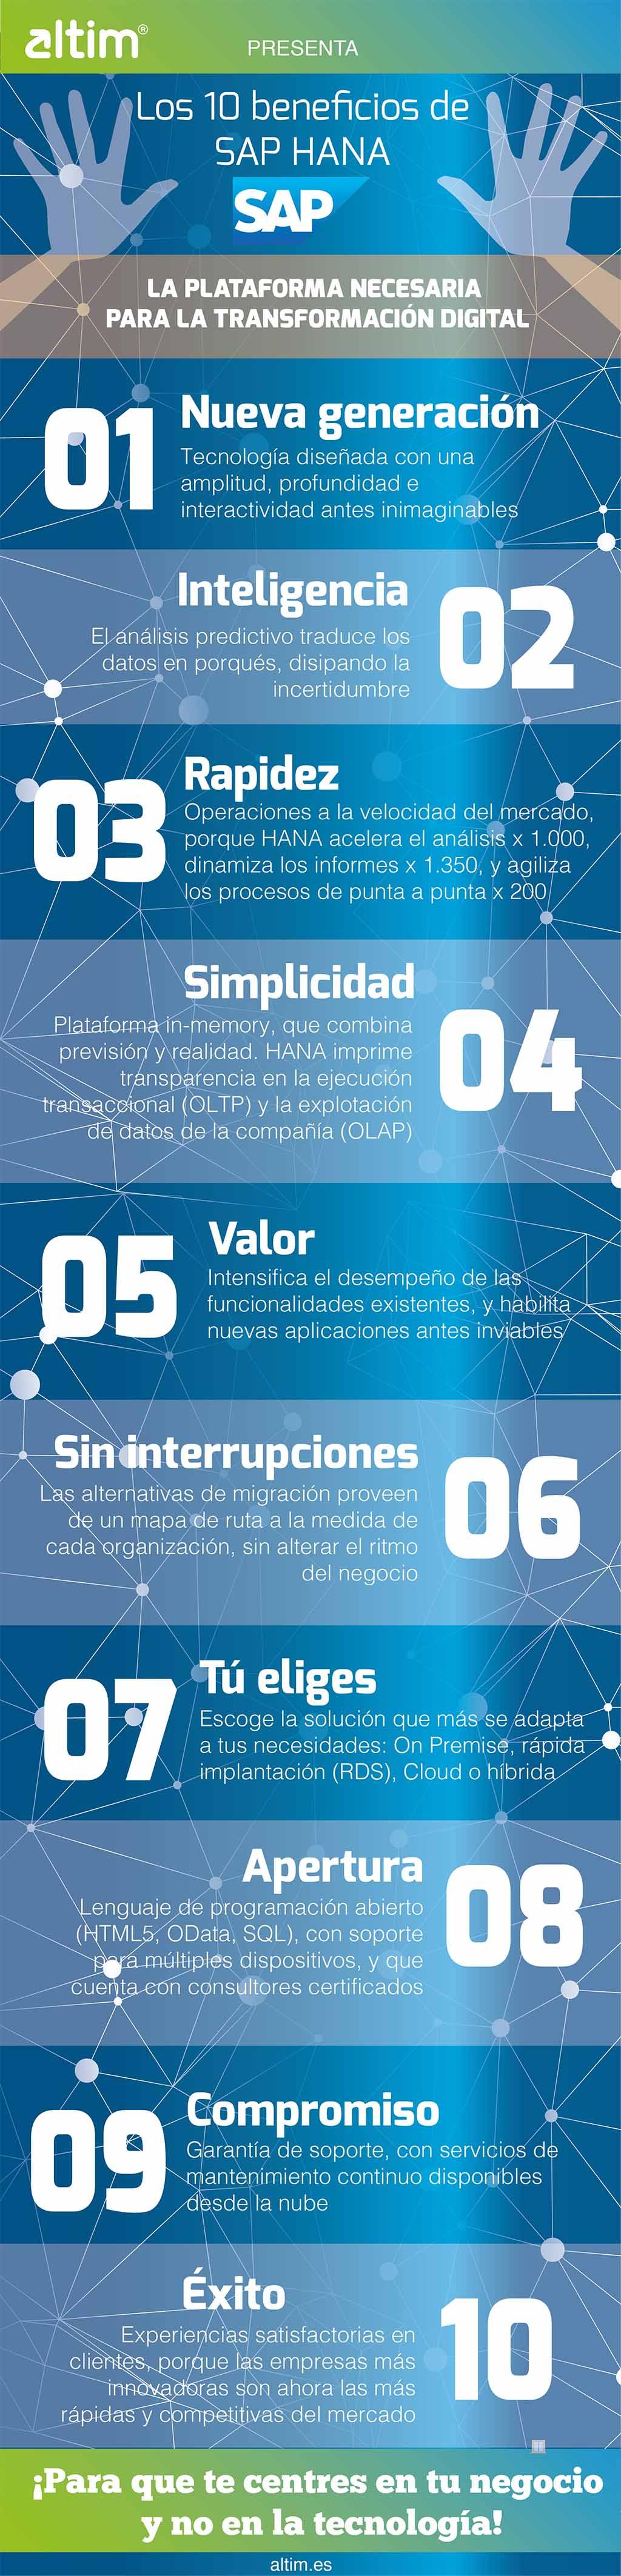 Infografías marketing digital portafolio klerr